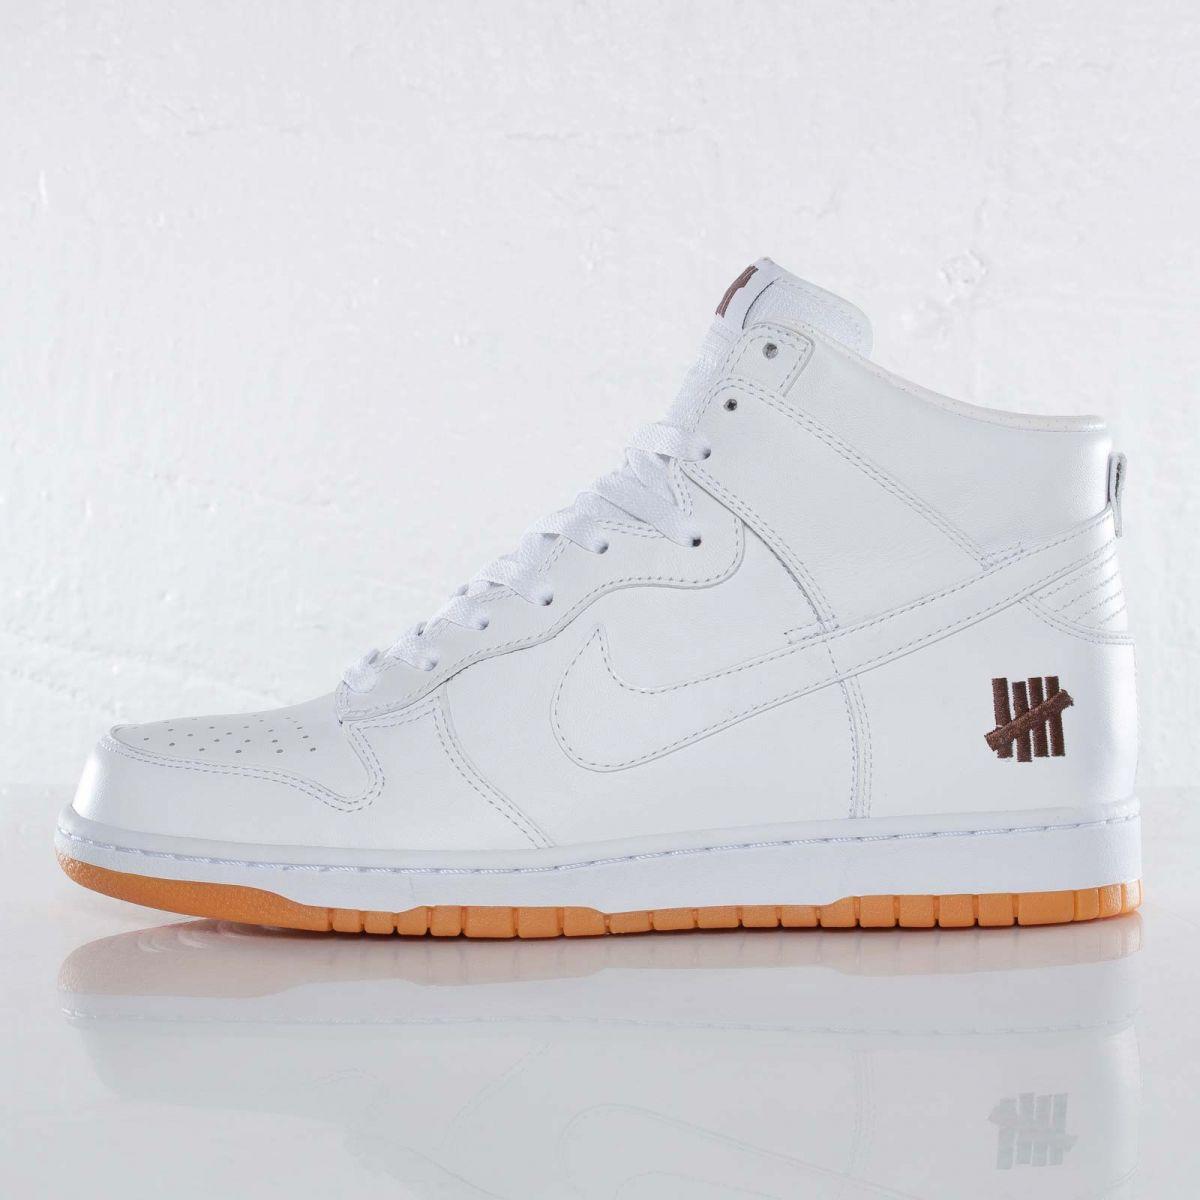 Undefeated x Nike Dunk Hi PRM -